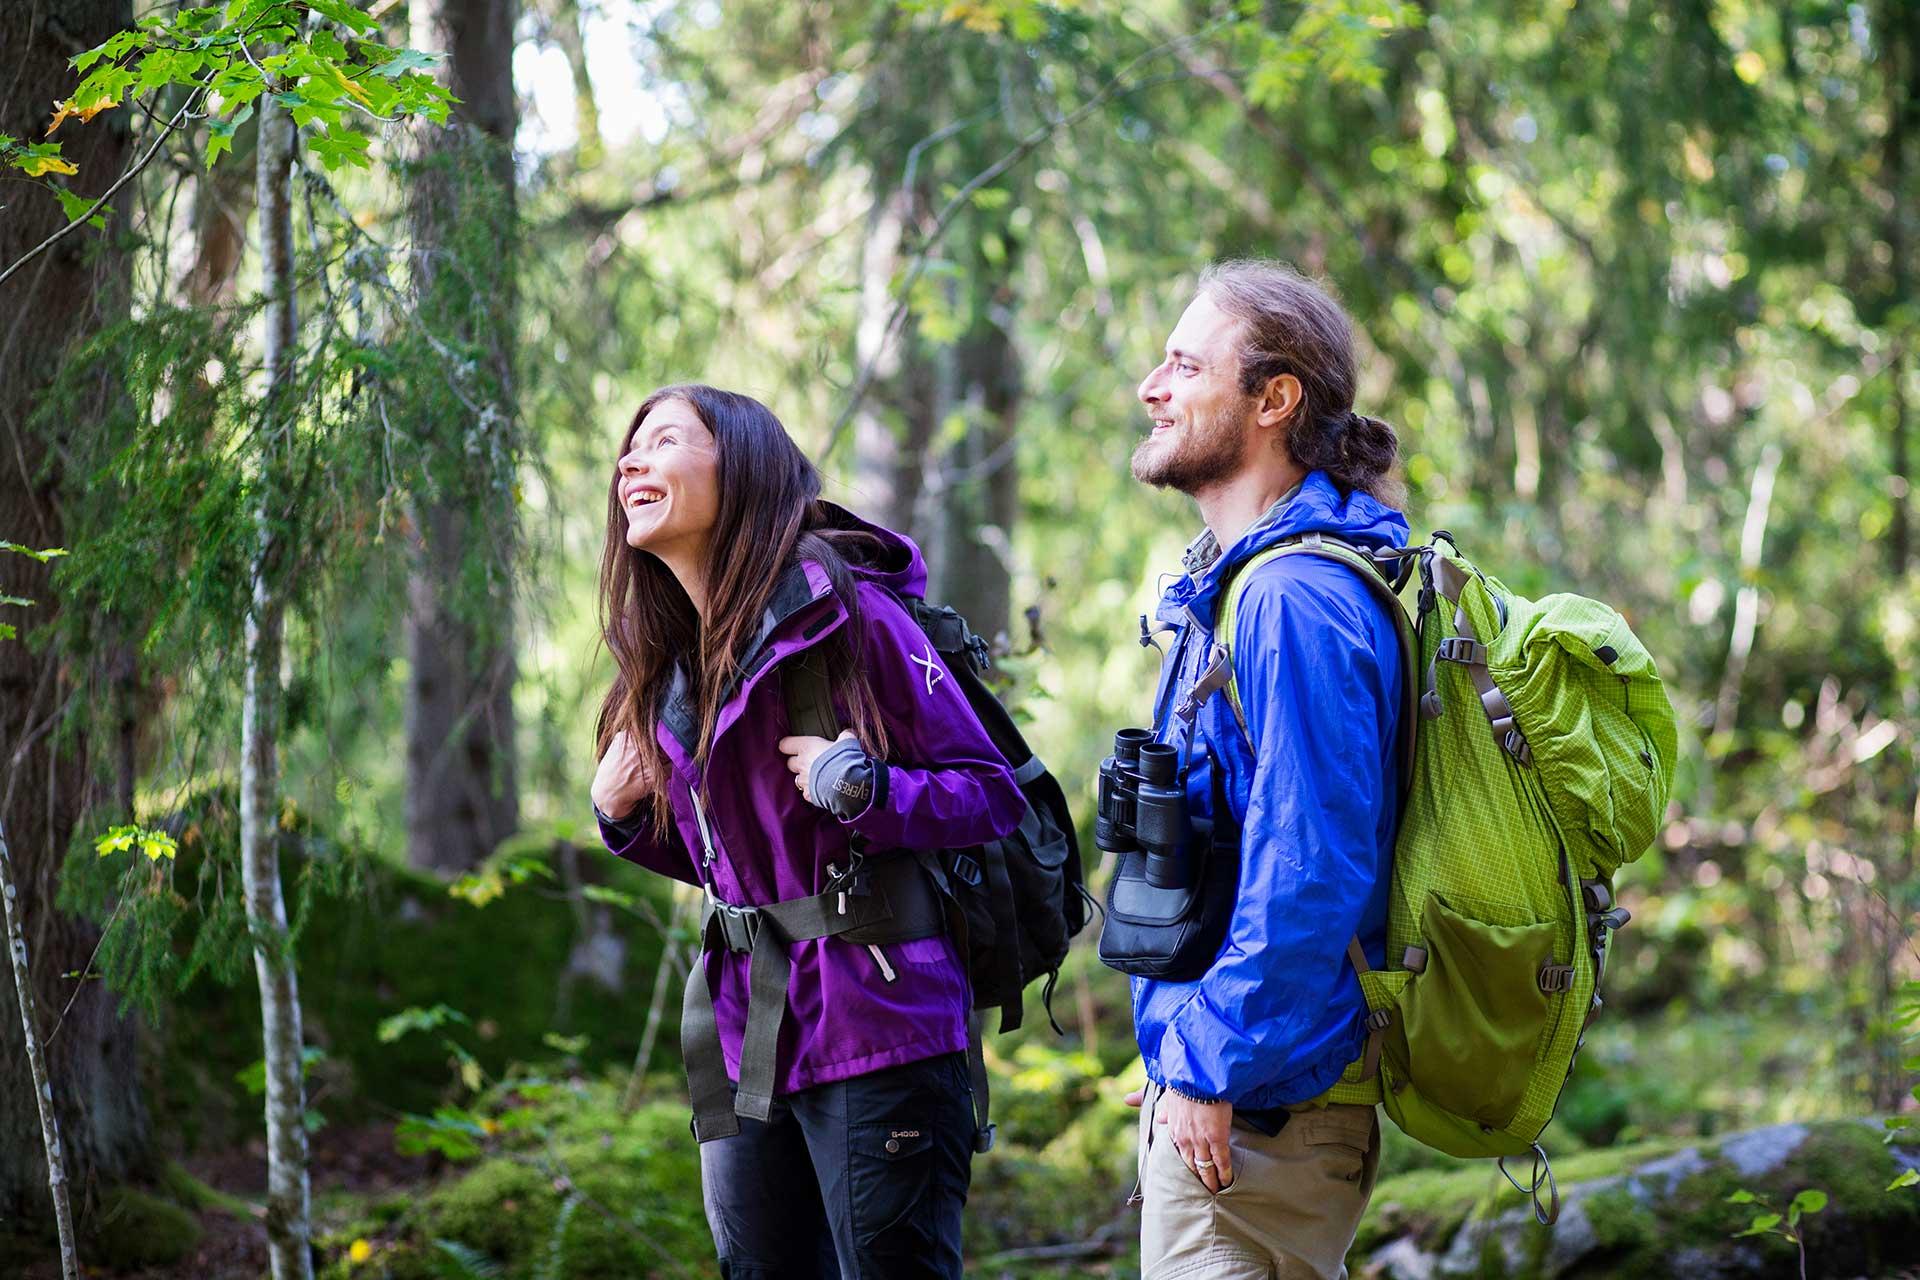 2 personer vandrar i skogen. Fotograf: Roger Borgelid